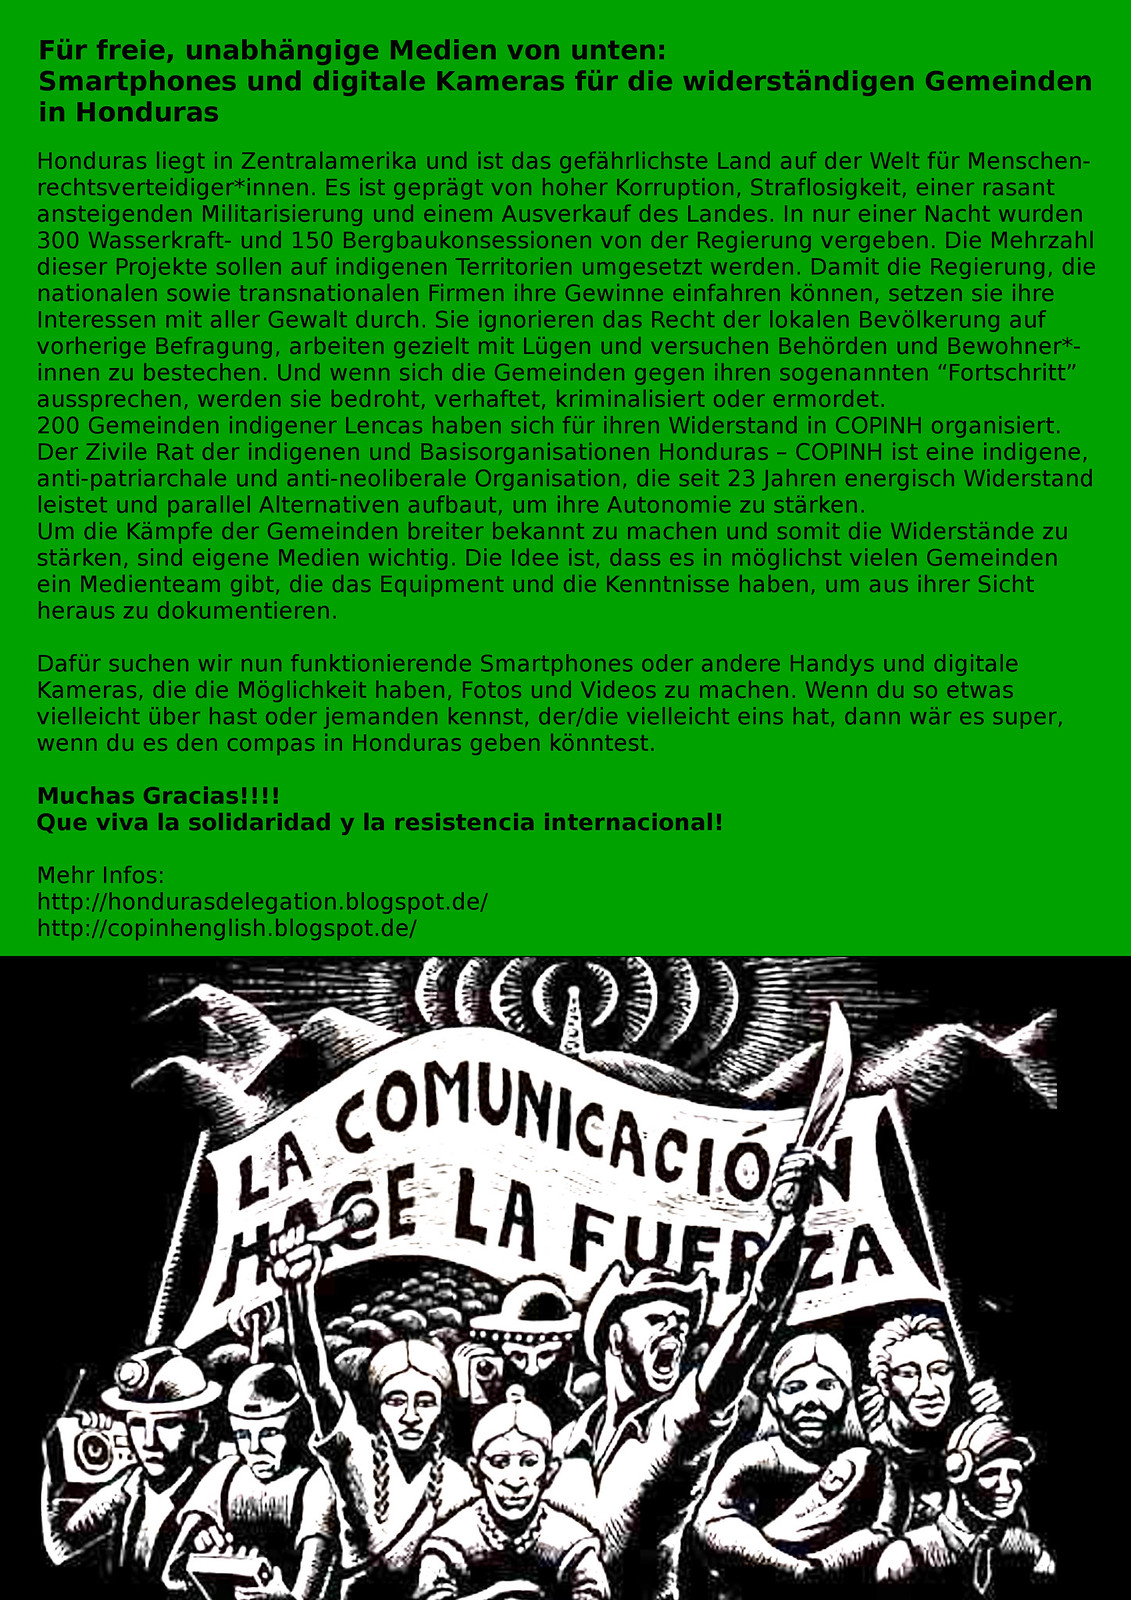 plakat Sammelaktion kameras